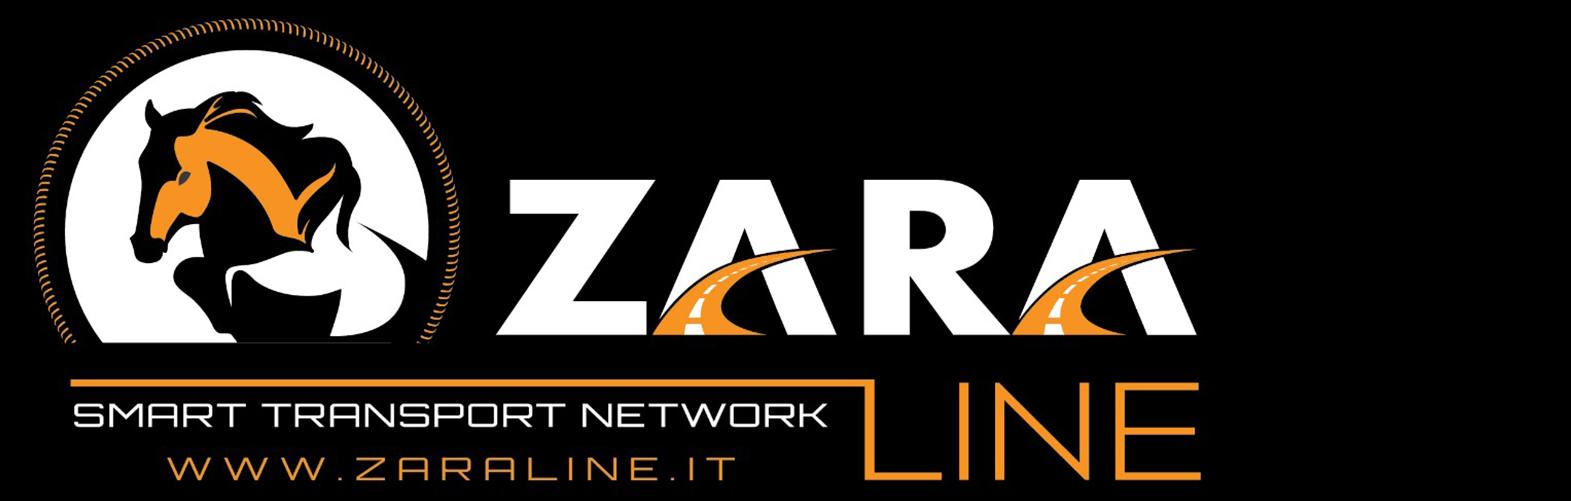 Zara Line